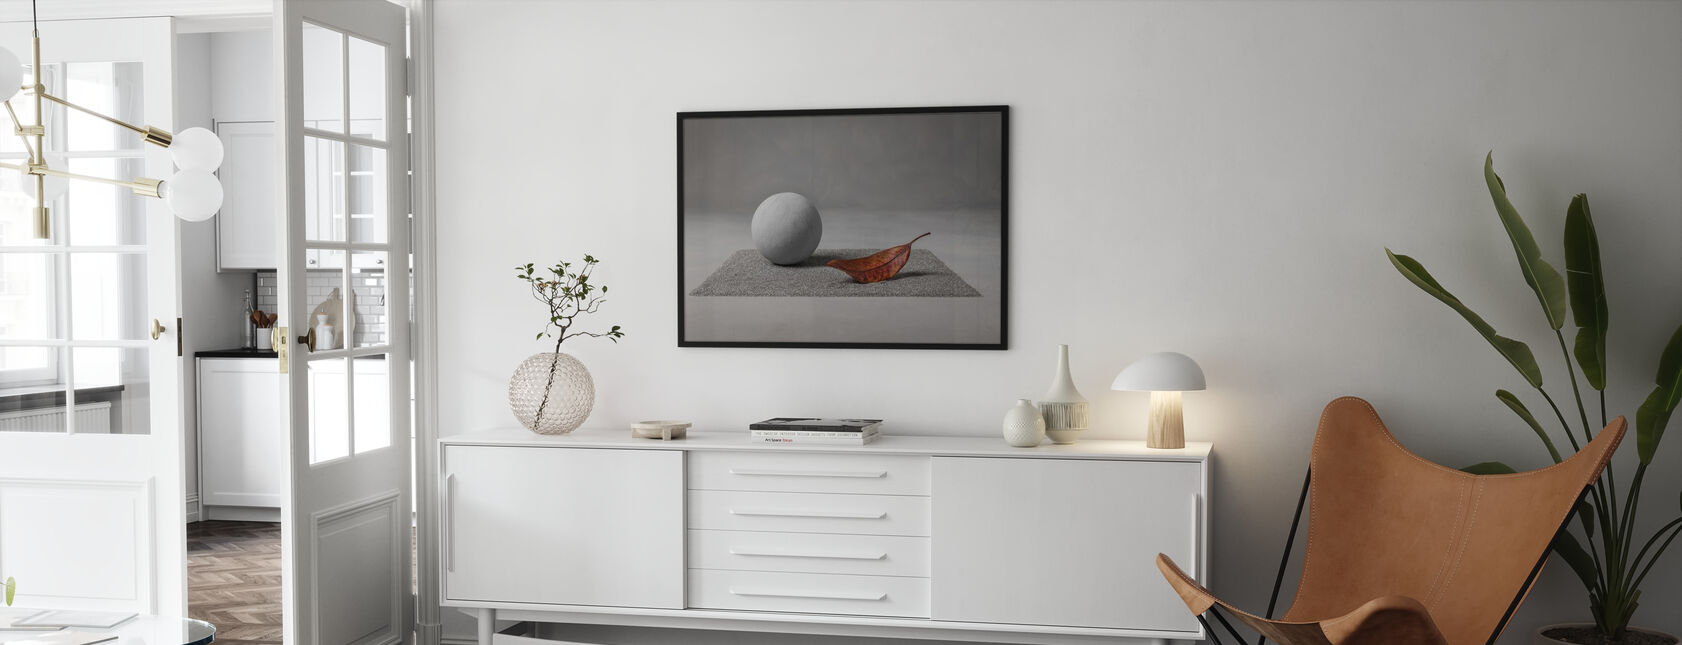 Maan landing - Ingelijste print - Woonkamer